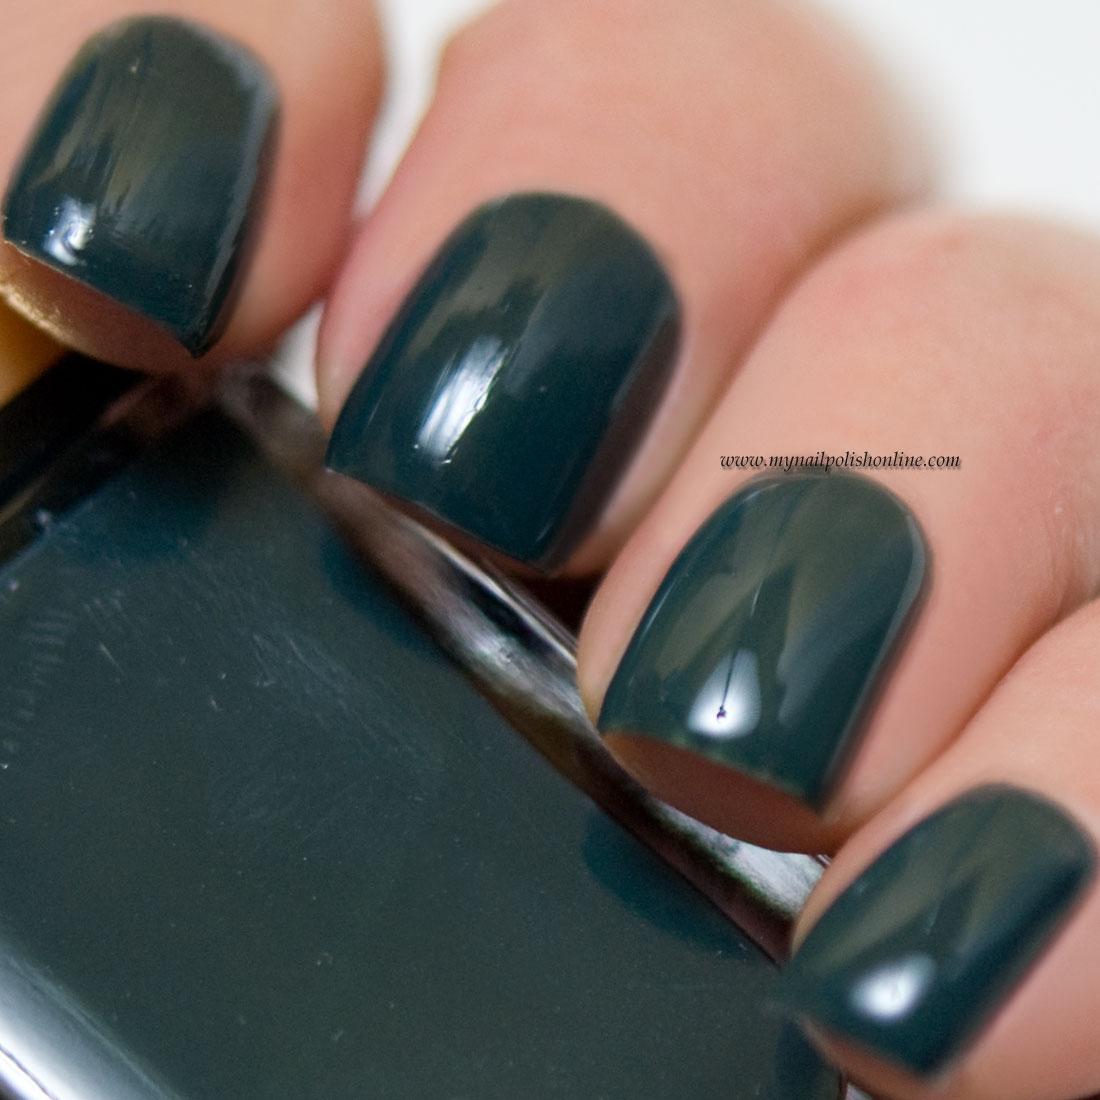 YSL - Fur Green